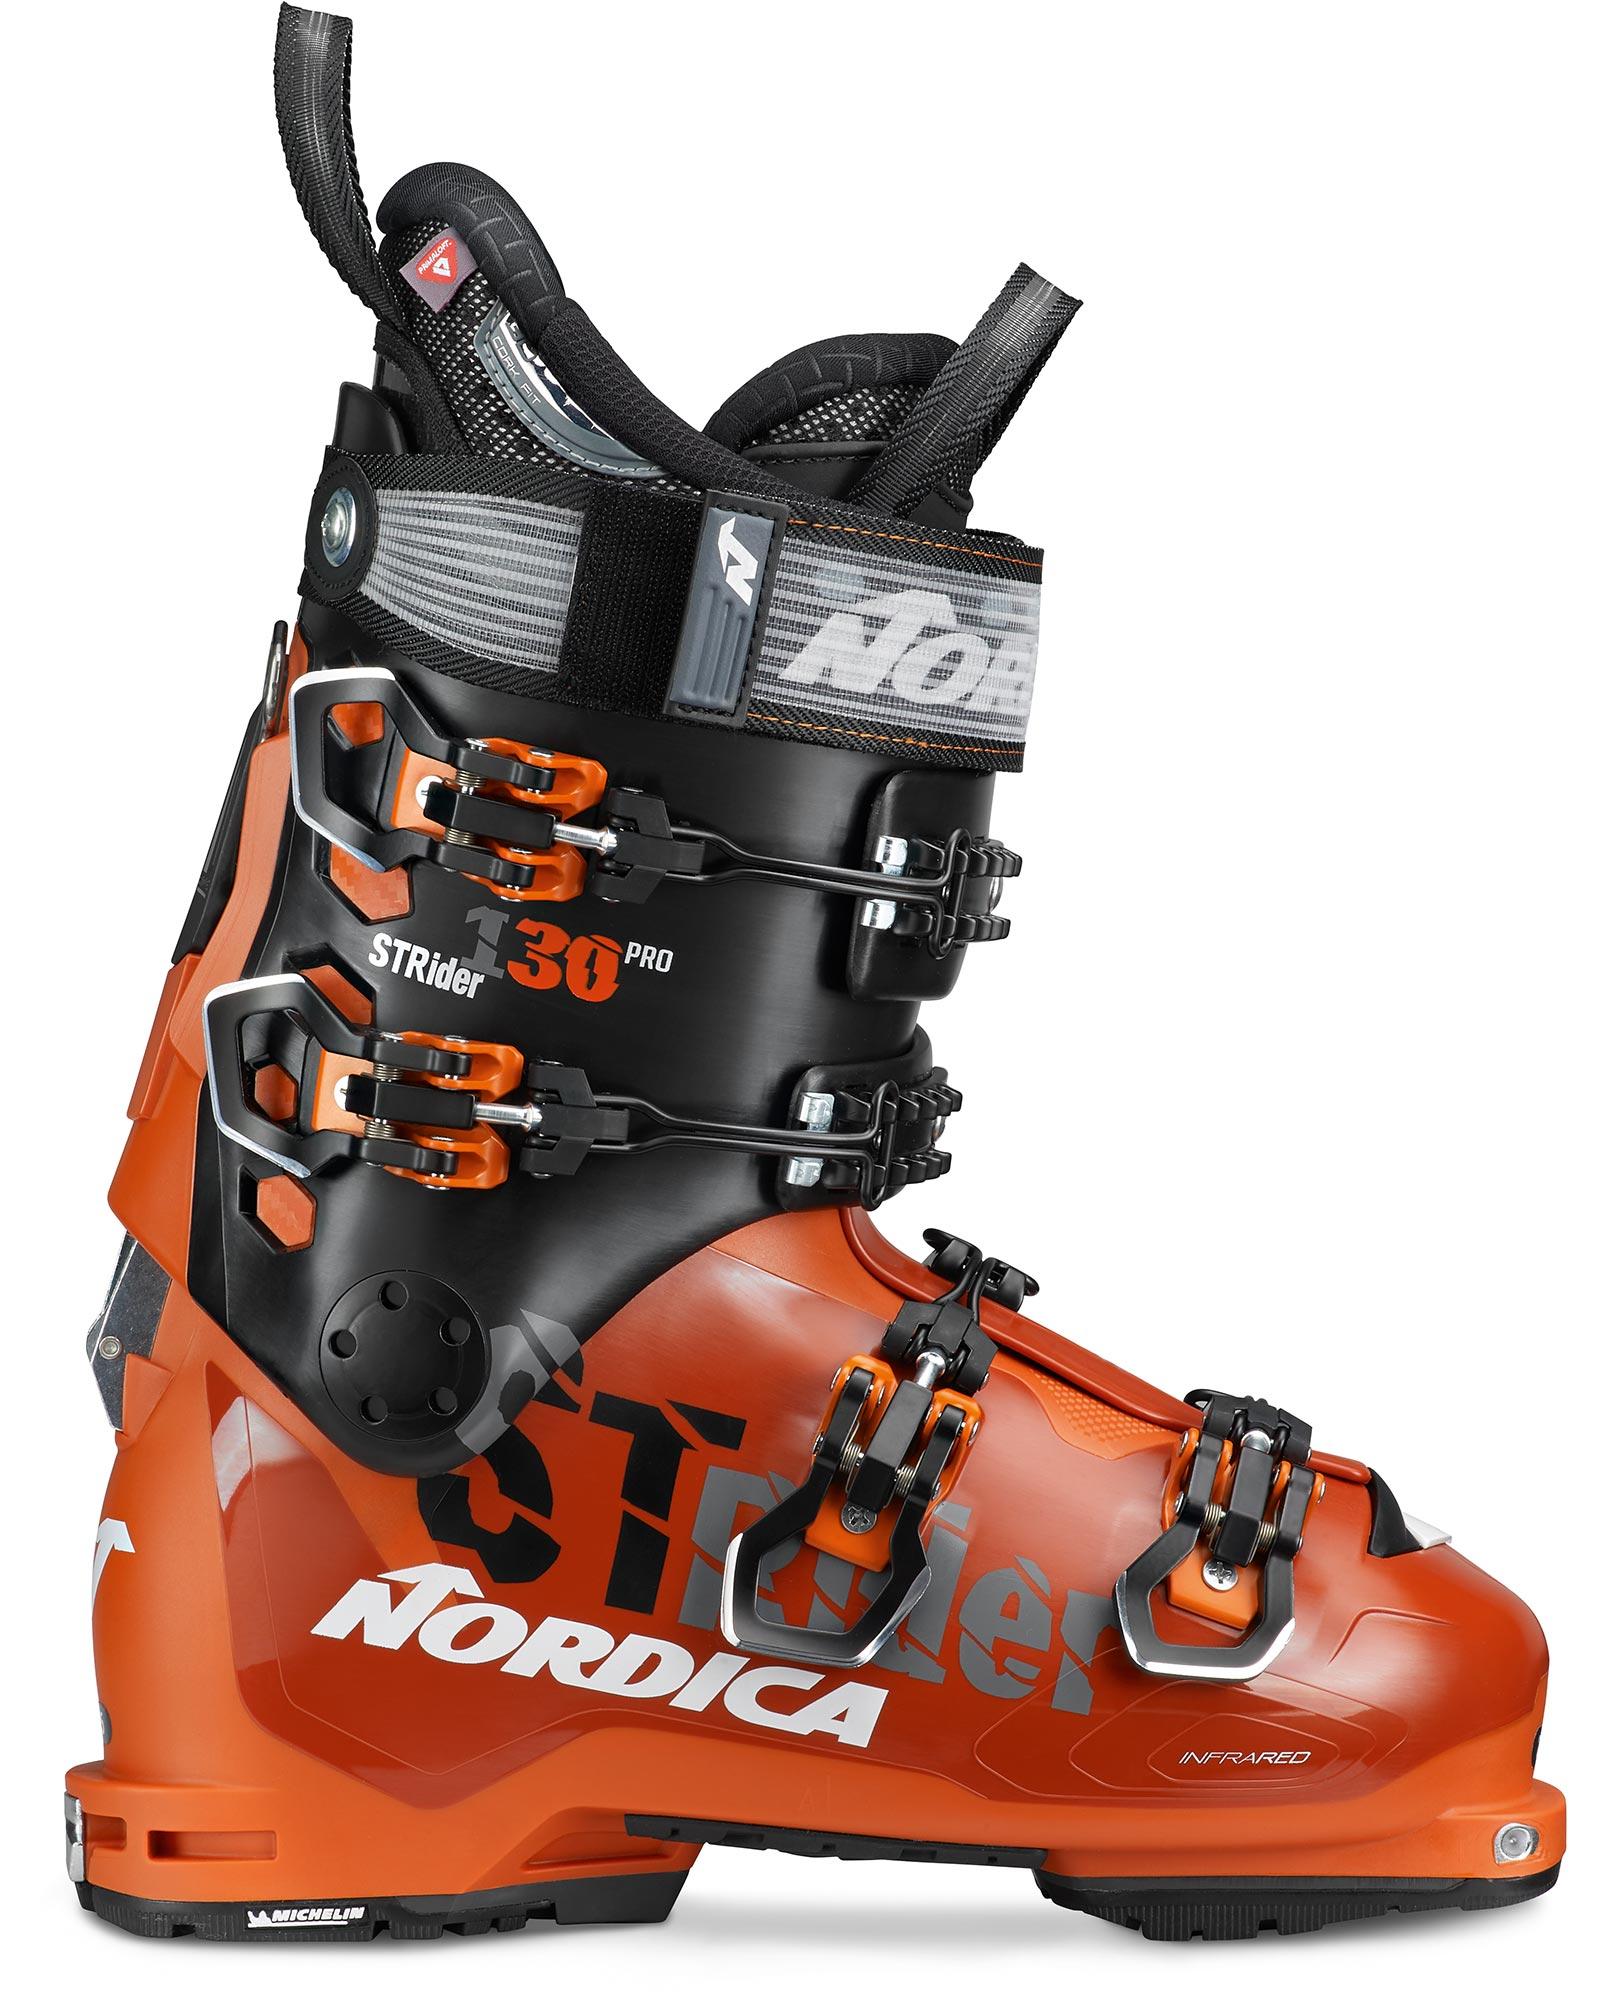 Nordica Men's Strider Pro 130 DYN Backcountry Ski Boots 2020 / 2021 0